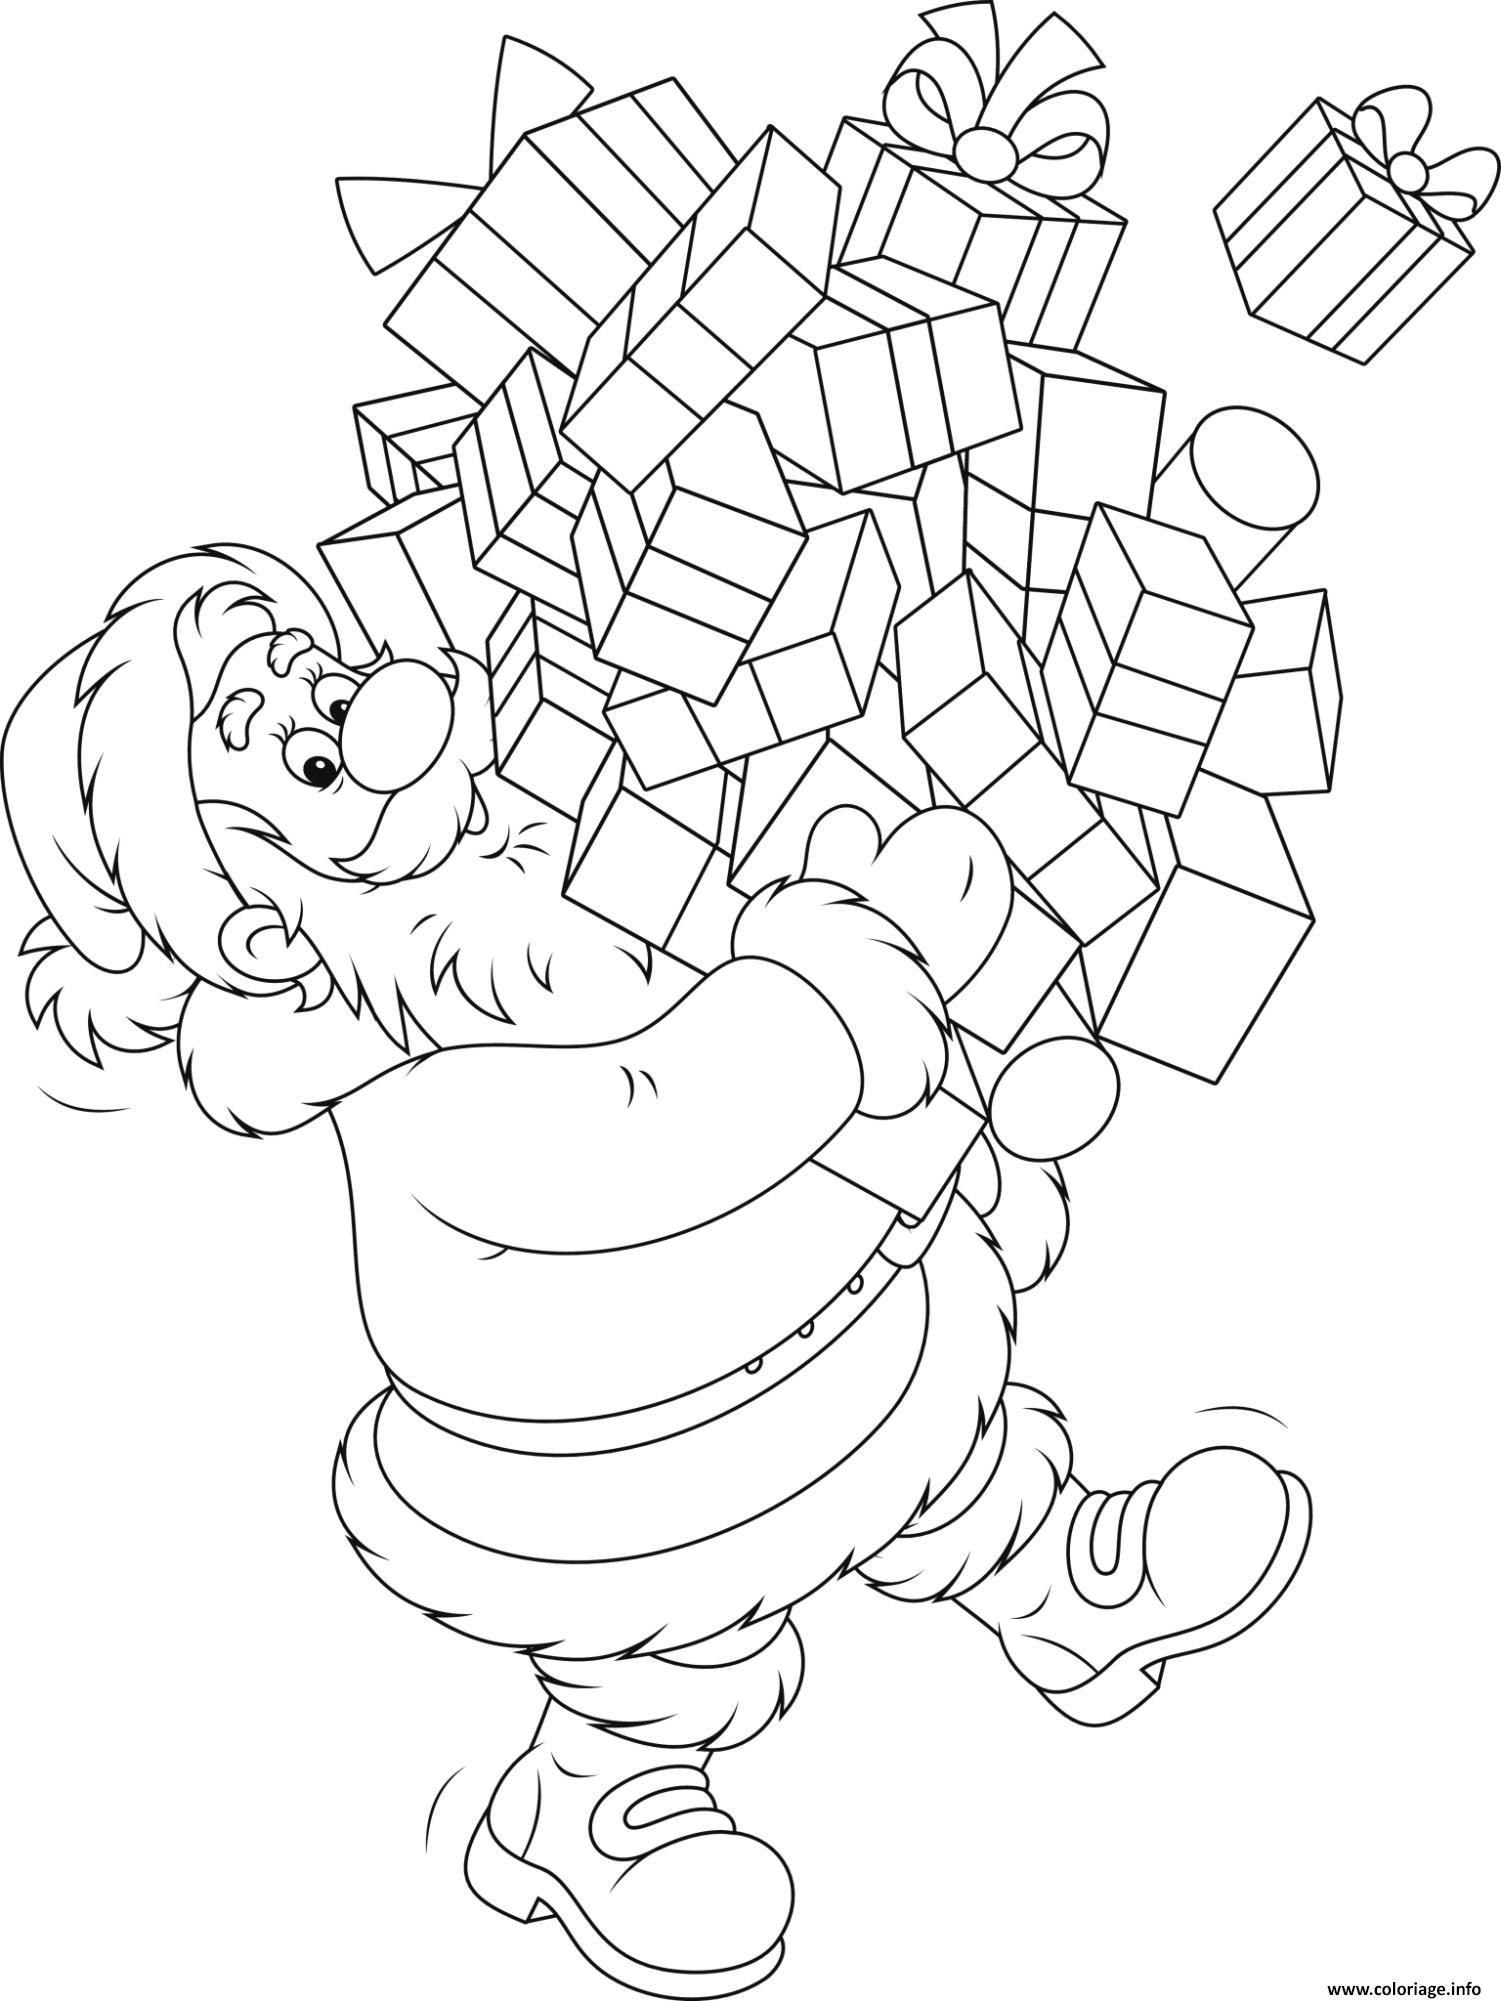 Coloriage pere noel avec pleins de cadeaux de noel dessin - Papa noel coloriage ...